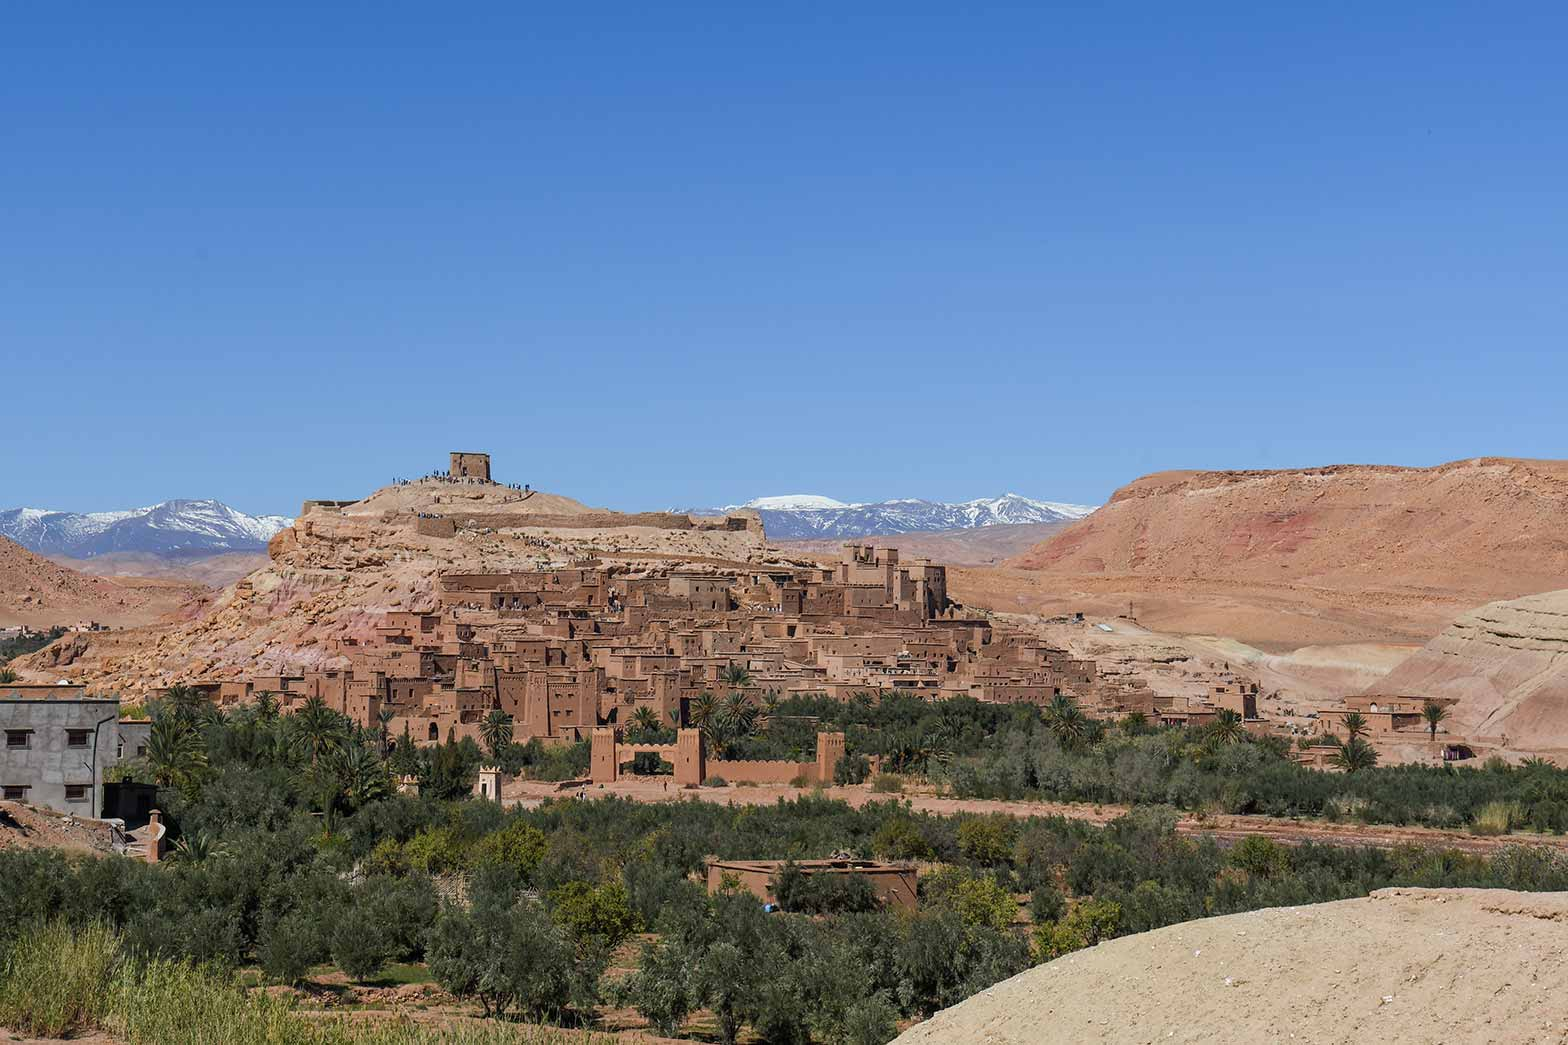 Ait Benhaddou historical site